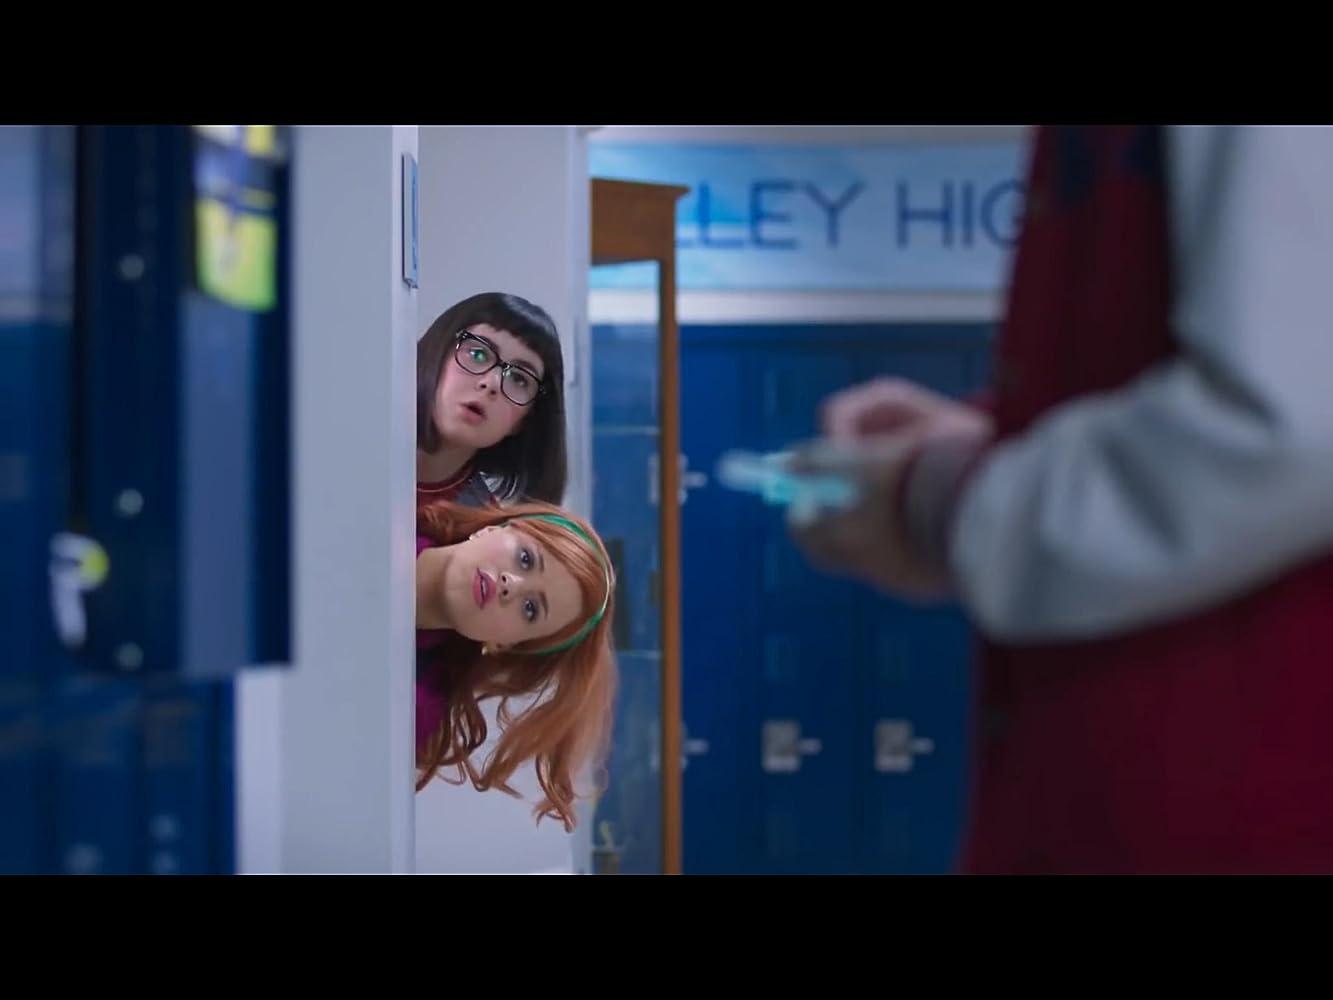 Sarah Gilman, Sarah Jeffery, and Evan Castelloe in Daphne & Velma (2018)